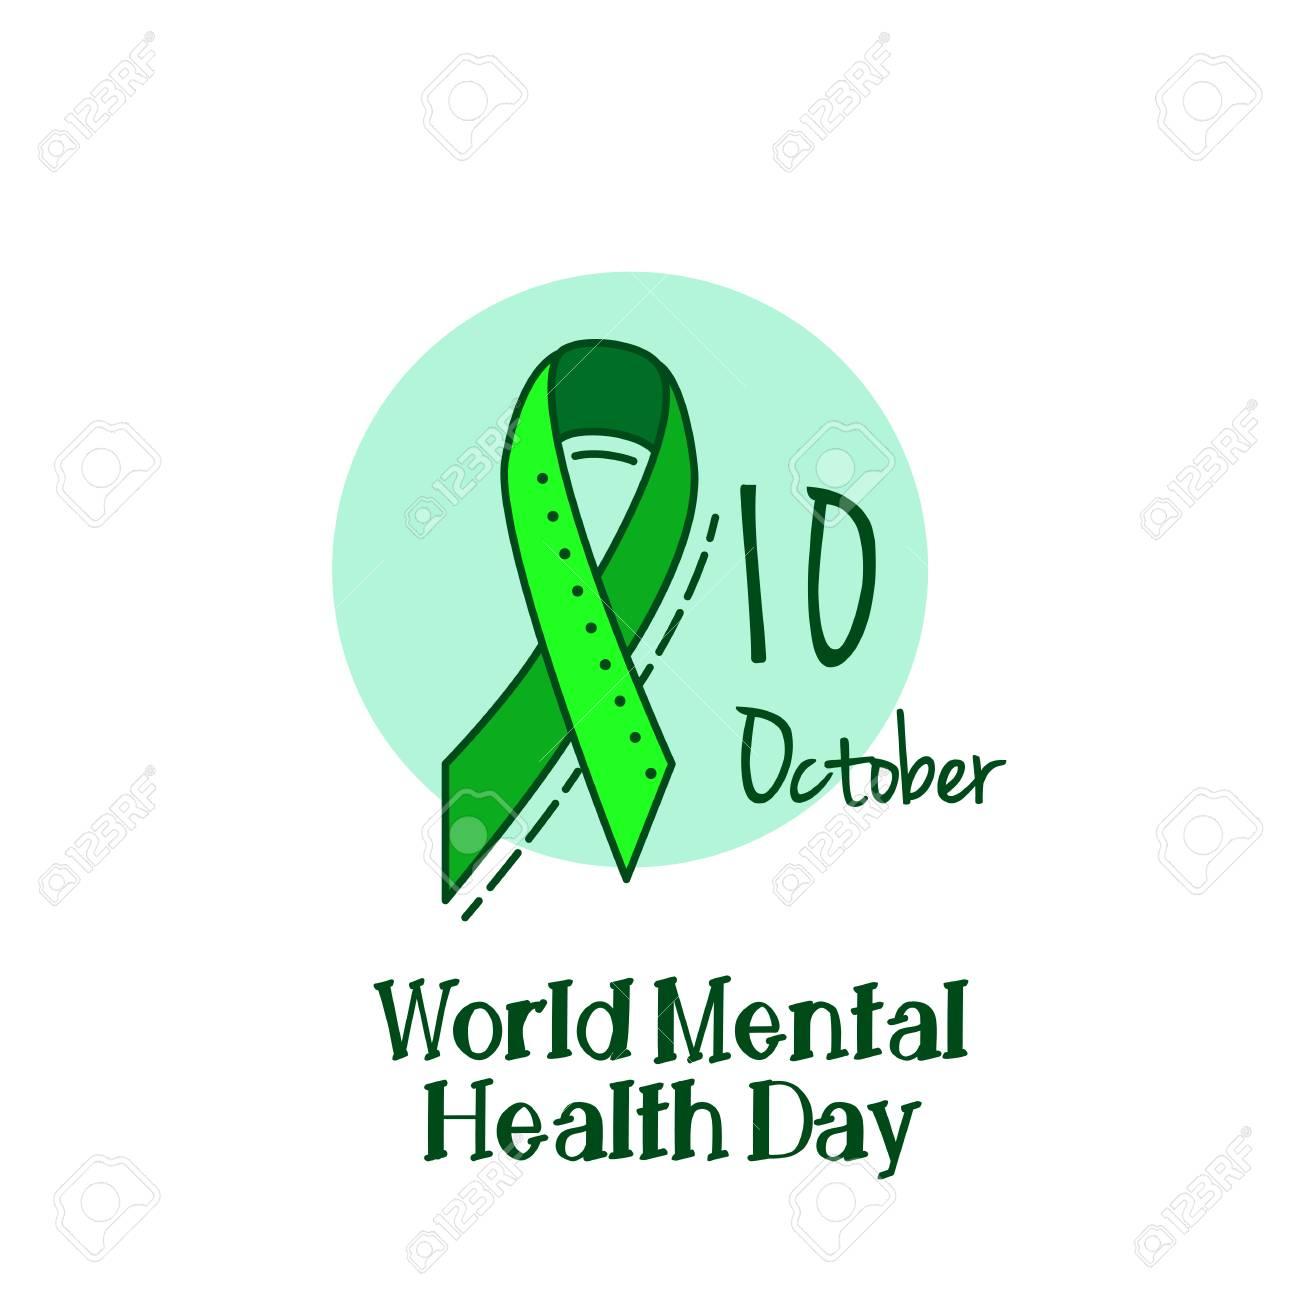 Mental Health Hepatitis B And Liver Cancer Or Non Hodgkin Lymphoma Awareness Green Ribbon